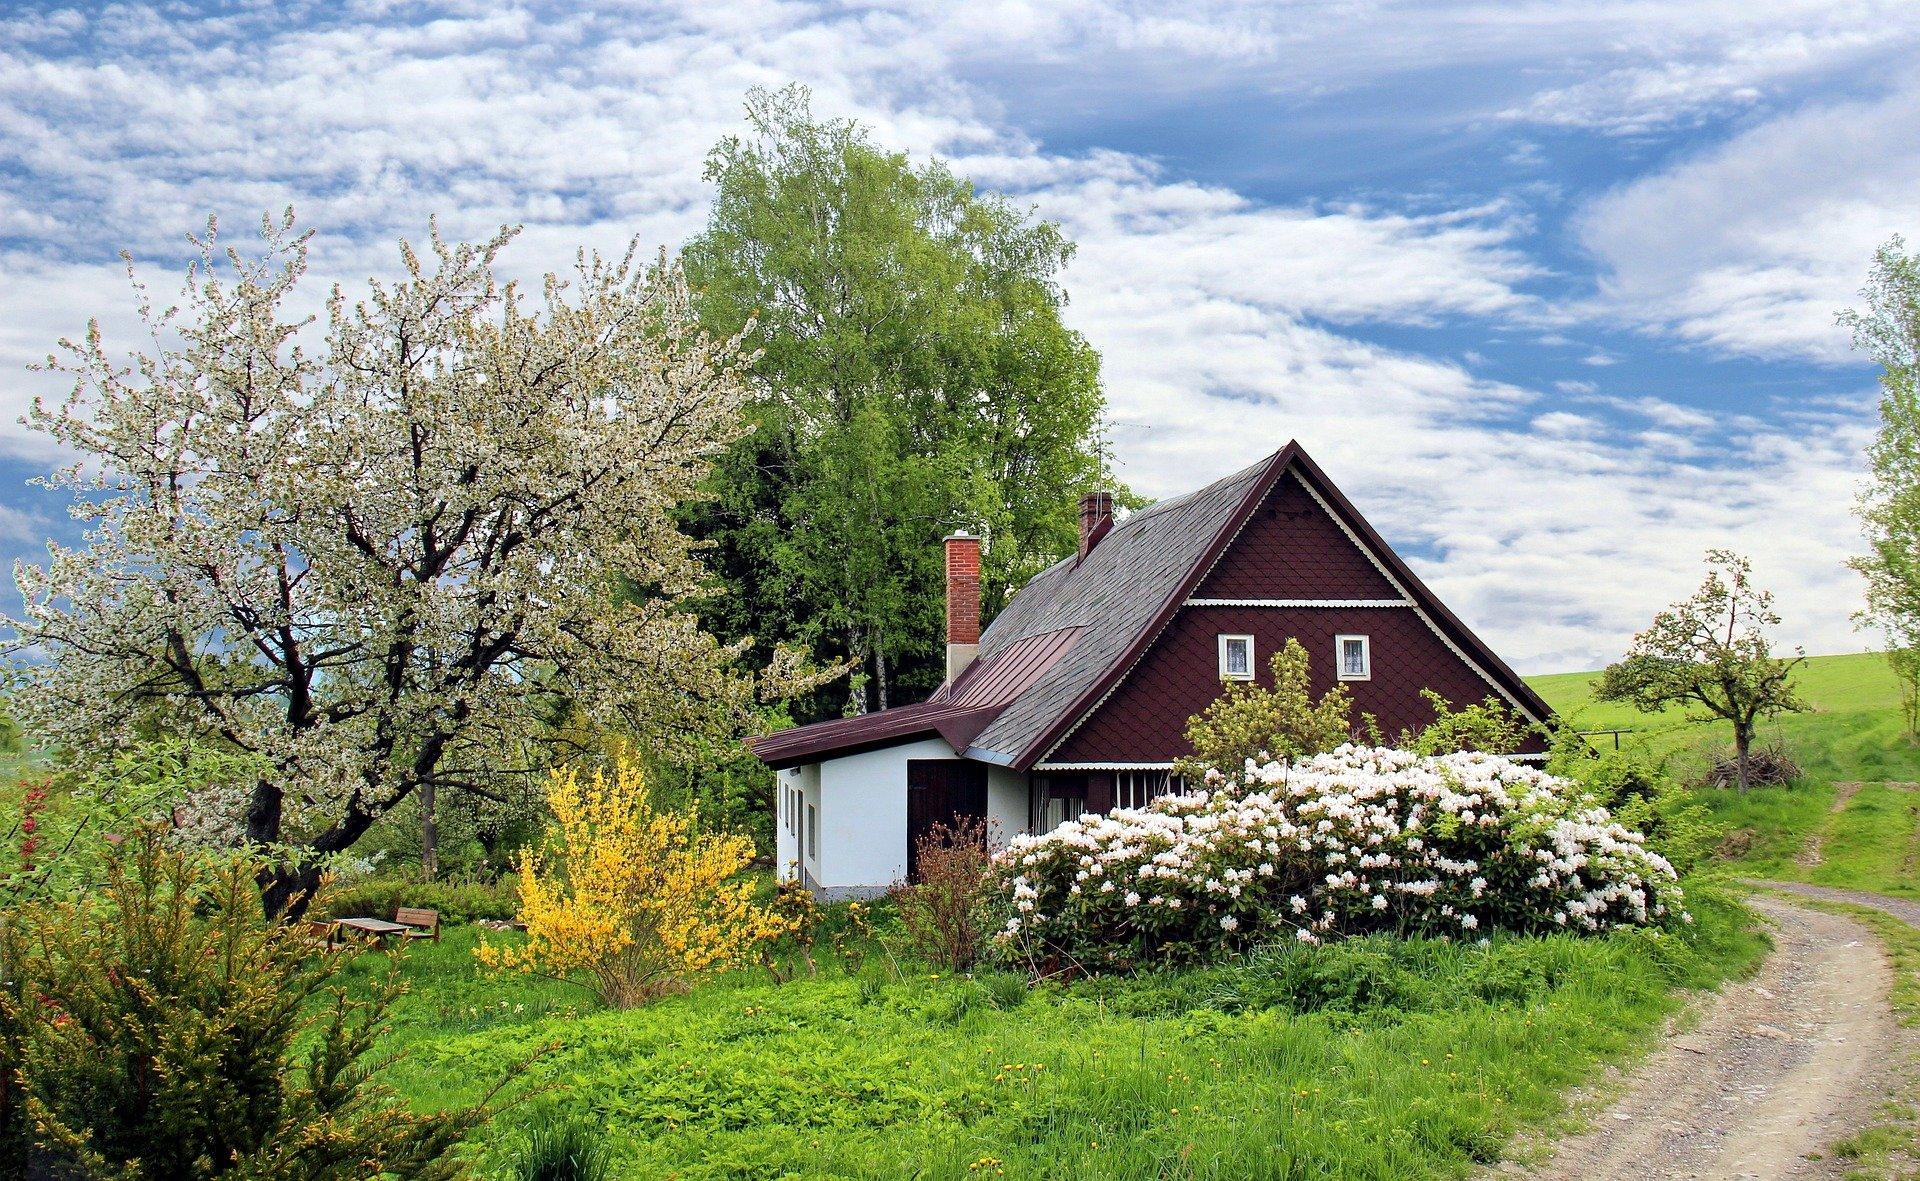 cottage-2955582_1920